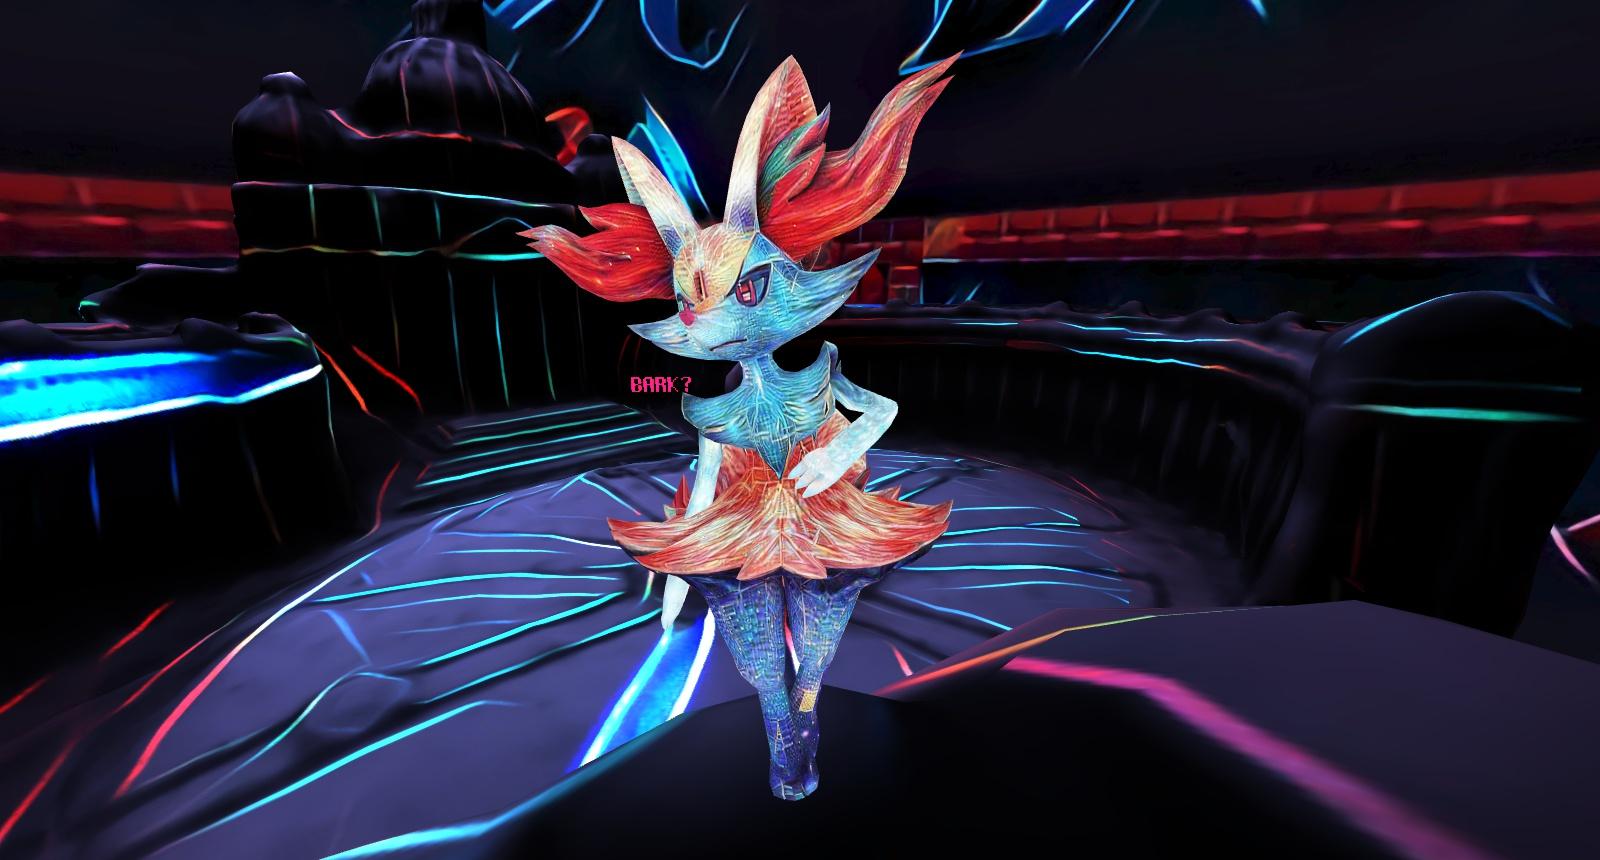 Style transfer on a Pokkén Tournament screenshot, used as my avatar